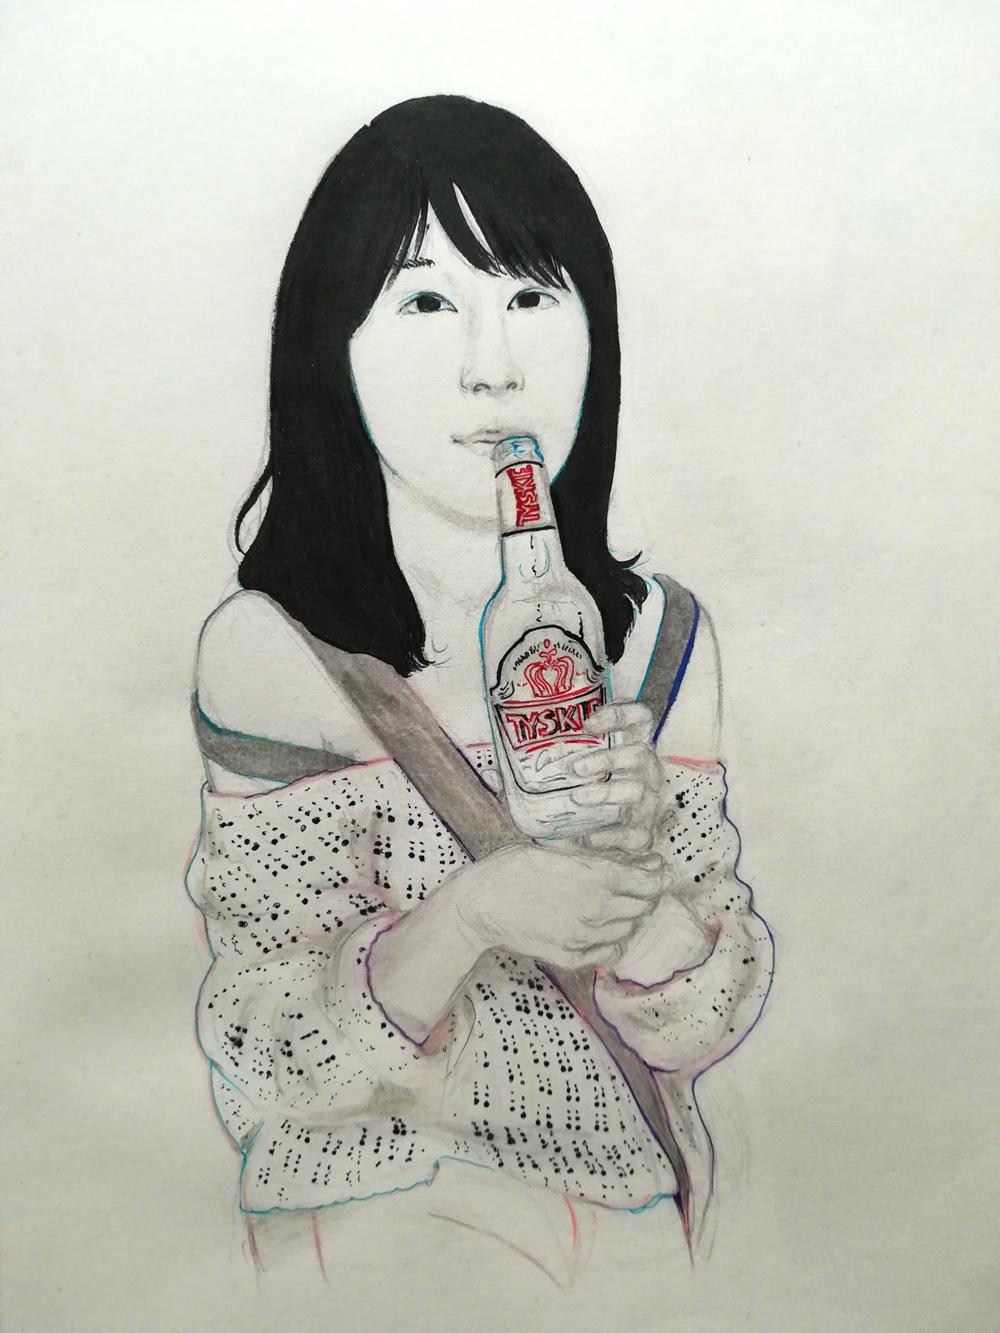 pen on paper 29 x 21 cm 2017